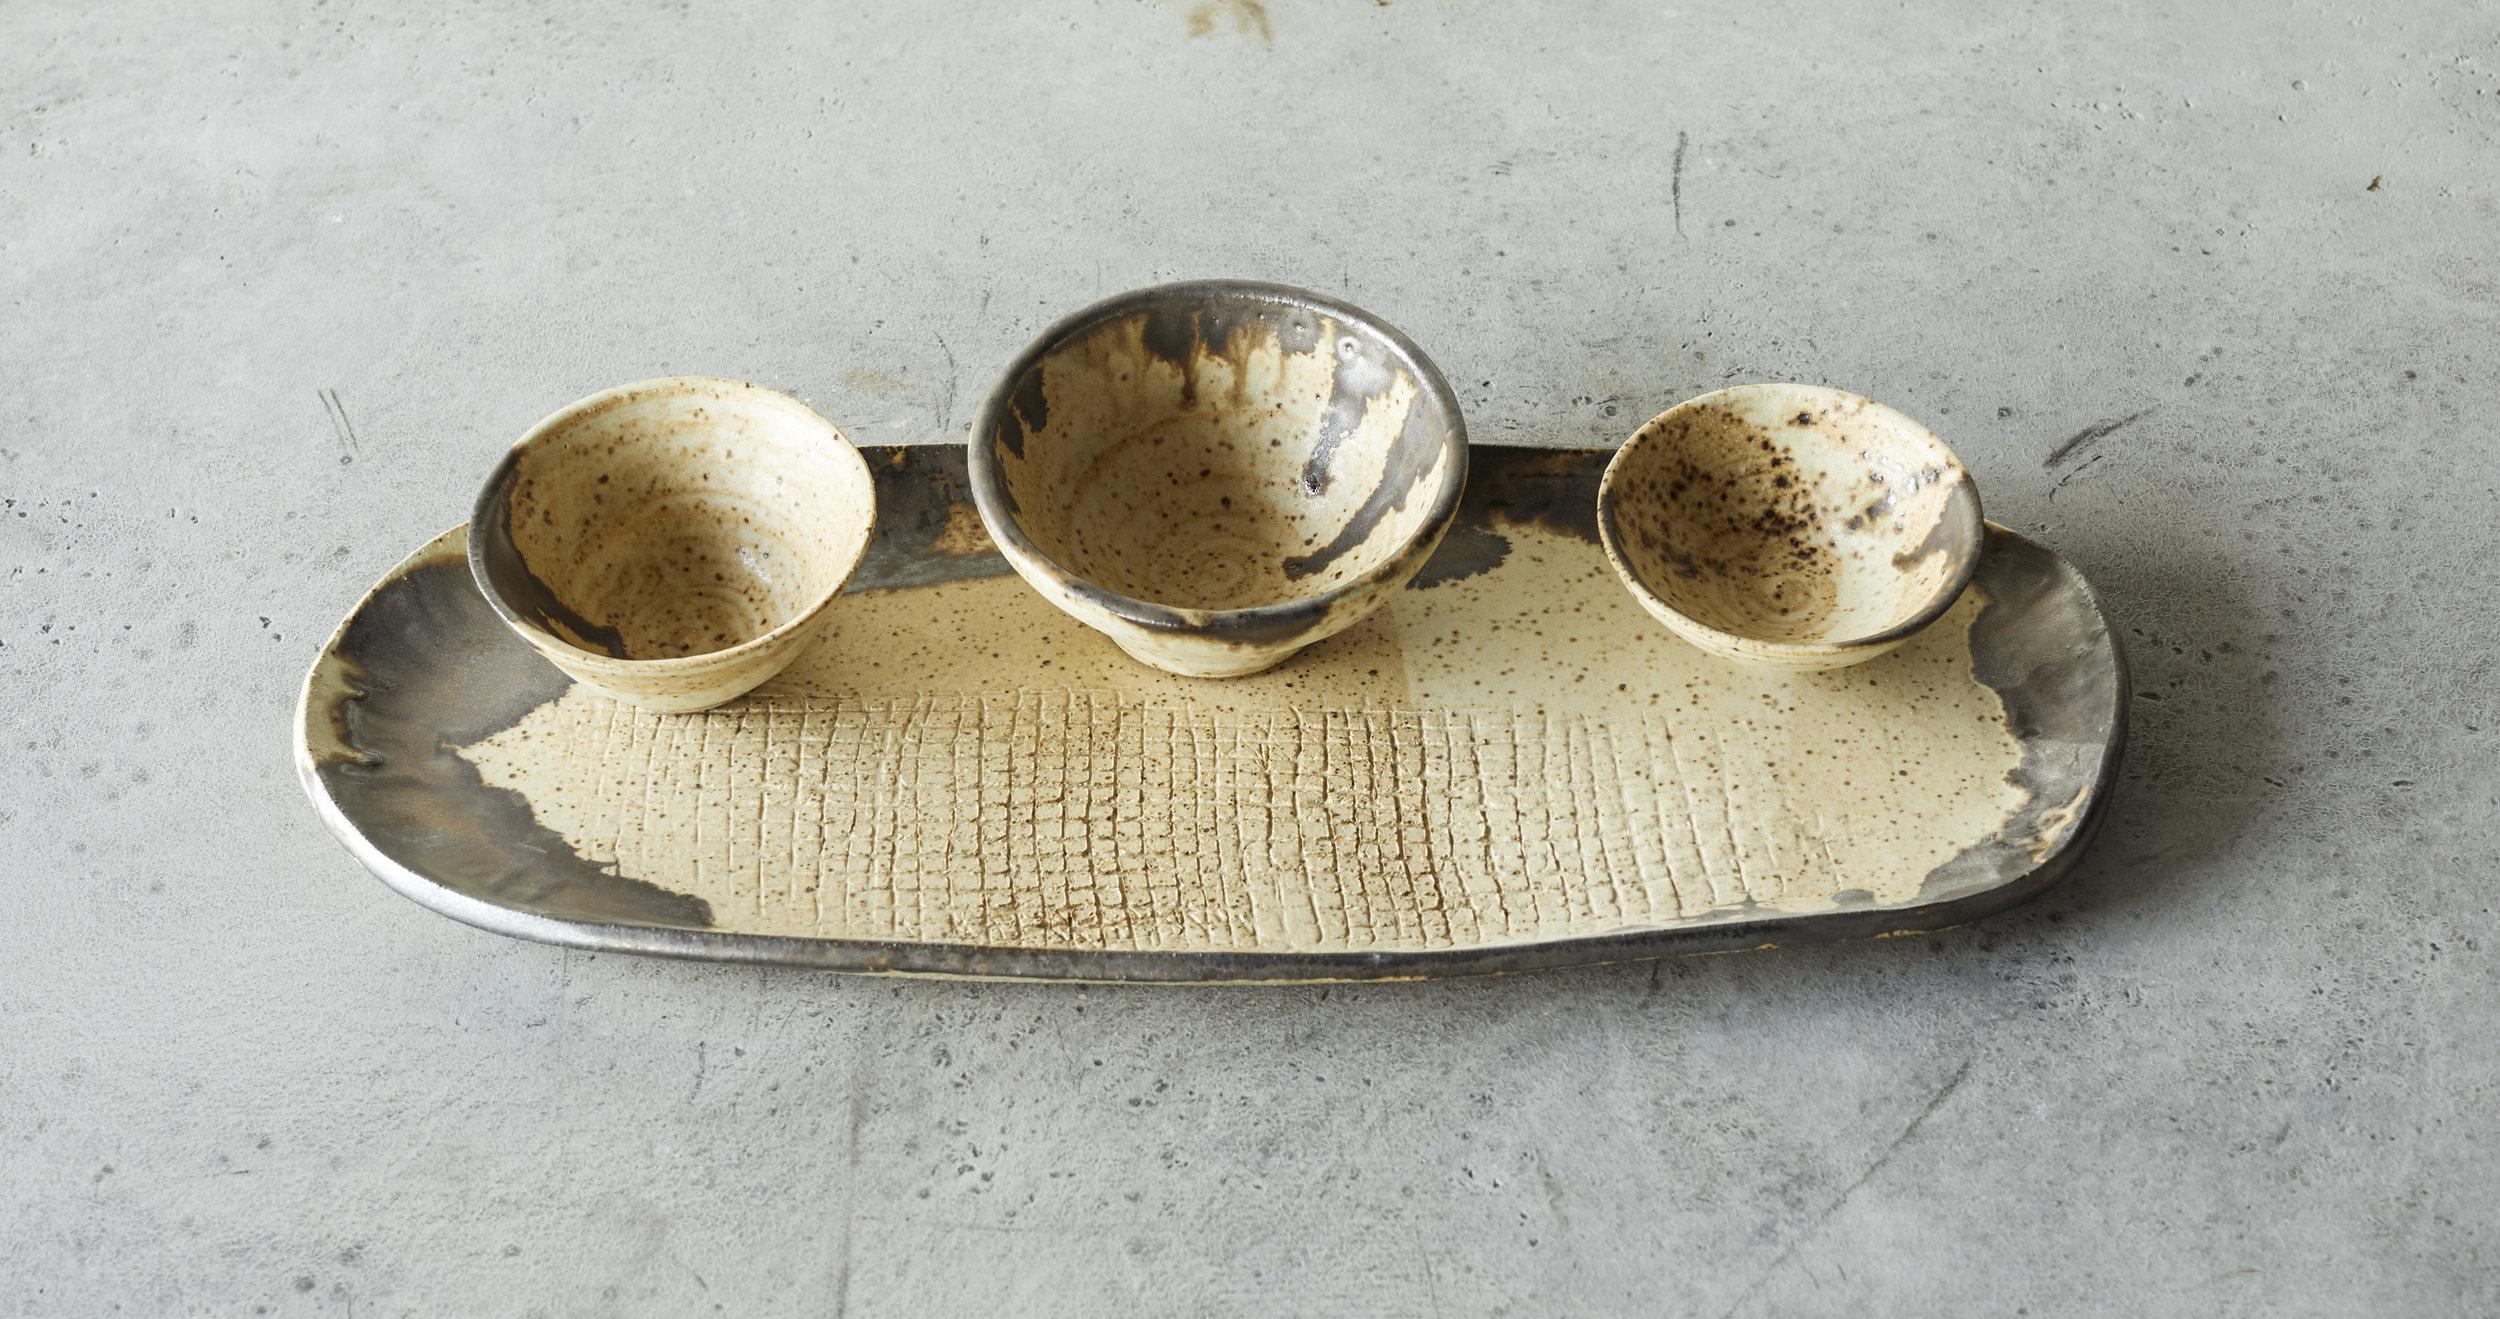 luna-ceramic-pottery-collection.jpg